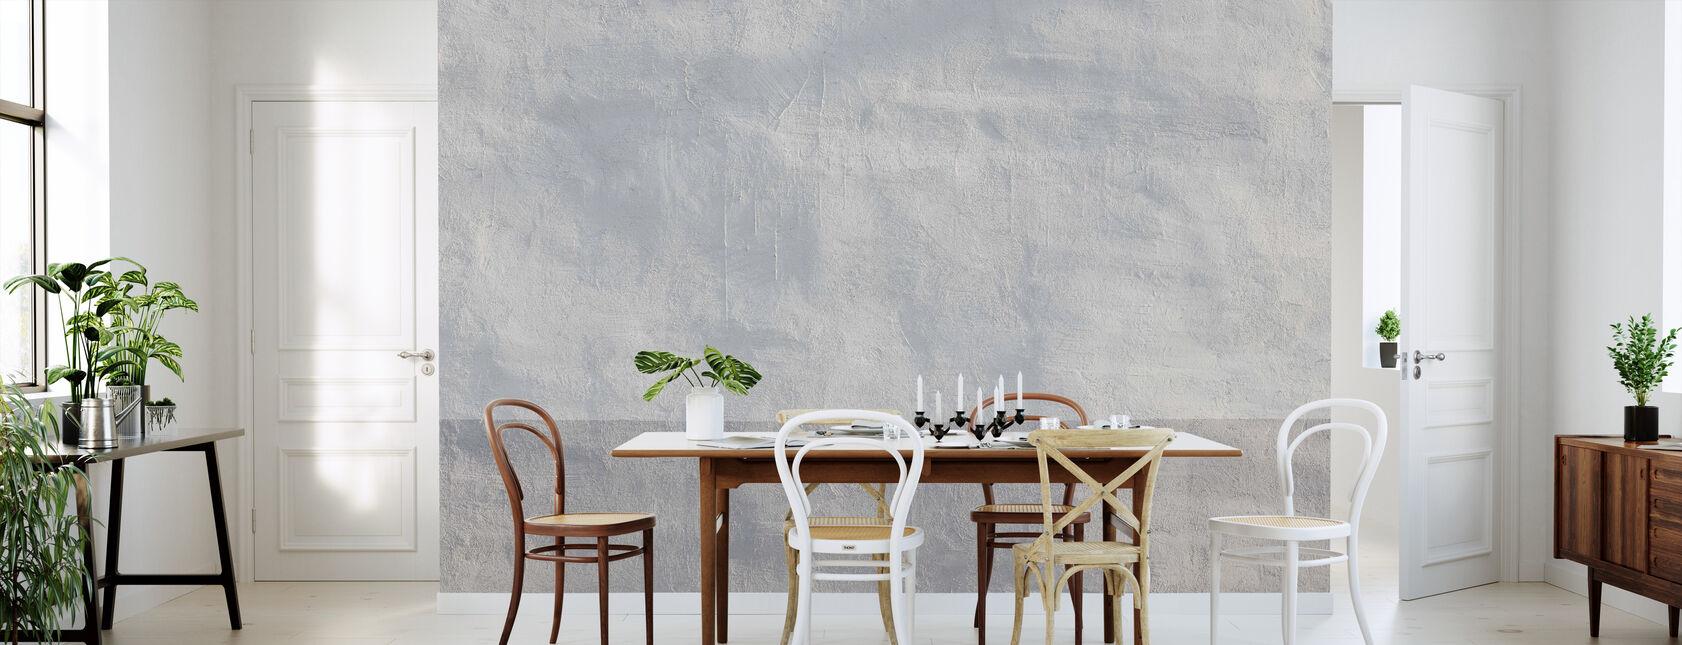 Gray Wall - Wallpaper - Kitchen